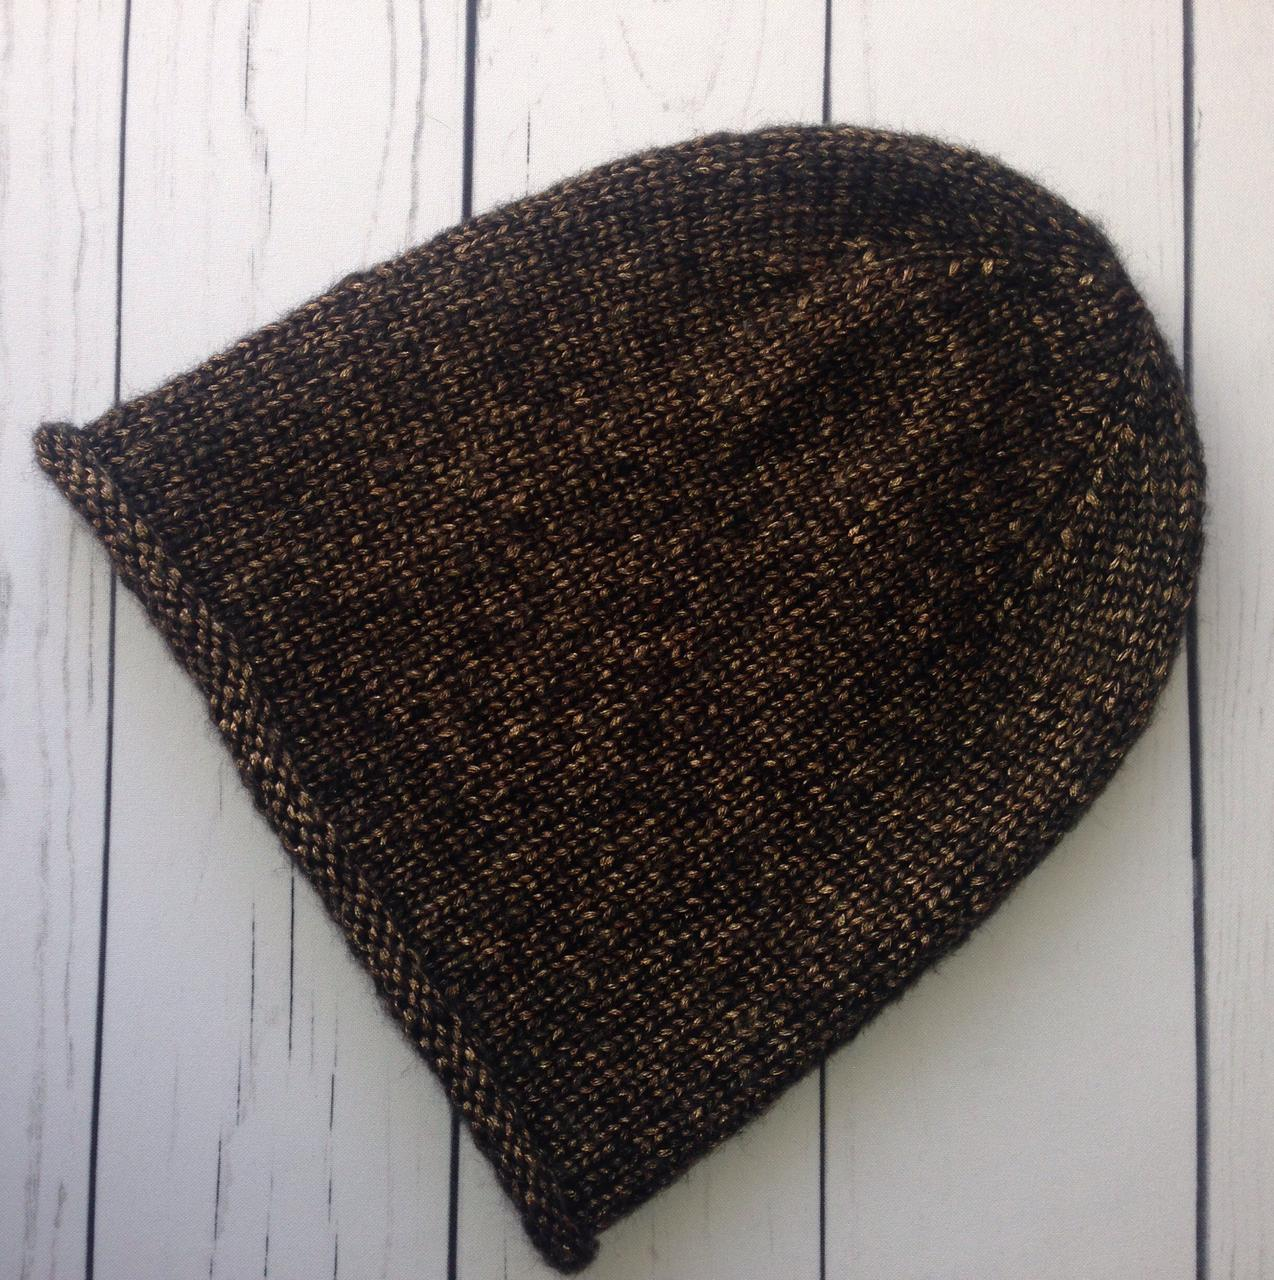 свитер из пряжи газал рок н ролл